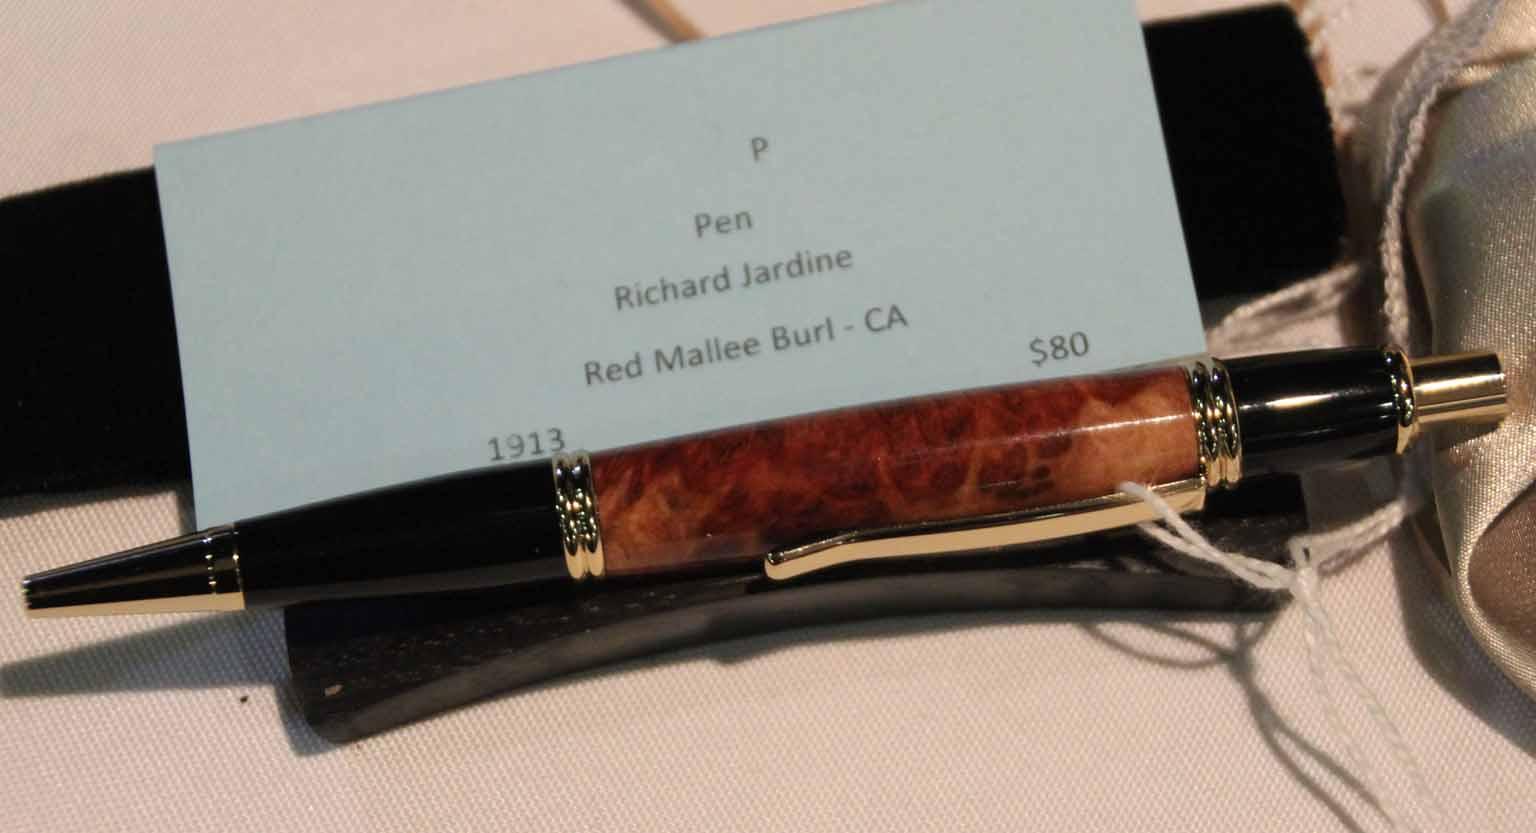 Richard Jardine Novice Pen, Red Mallee B